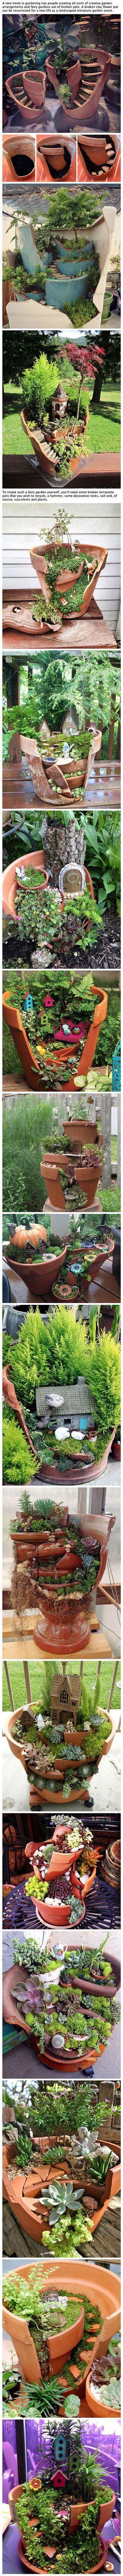 Broken pots turned into beautiful fairy gardens my designs in